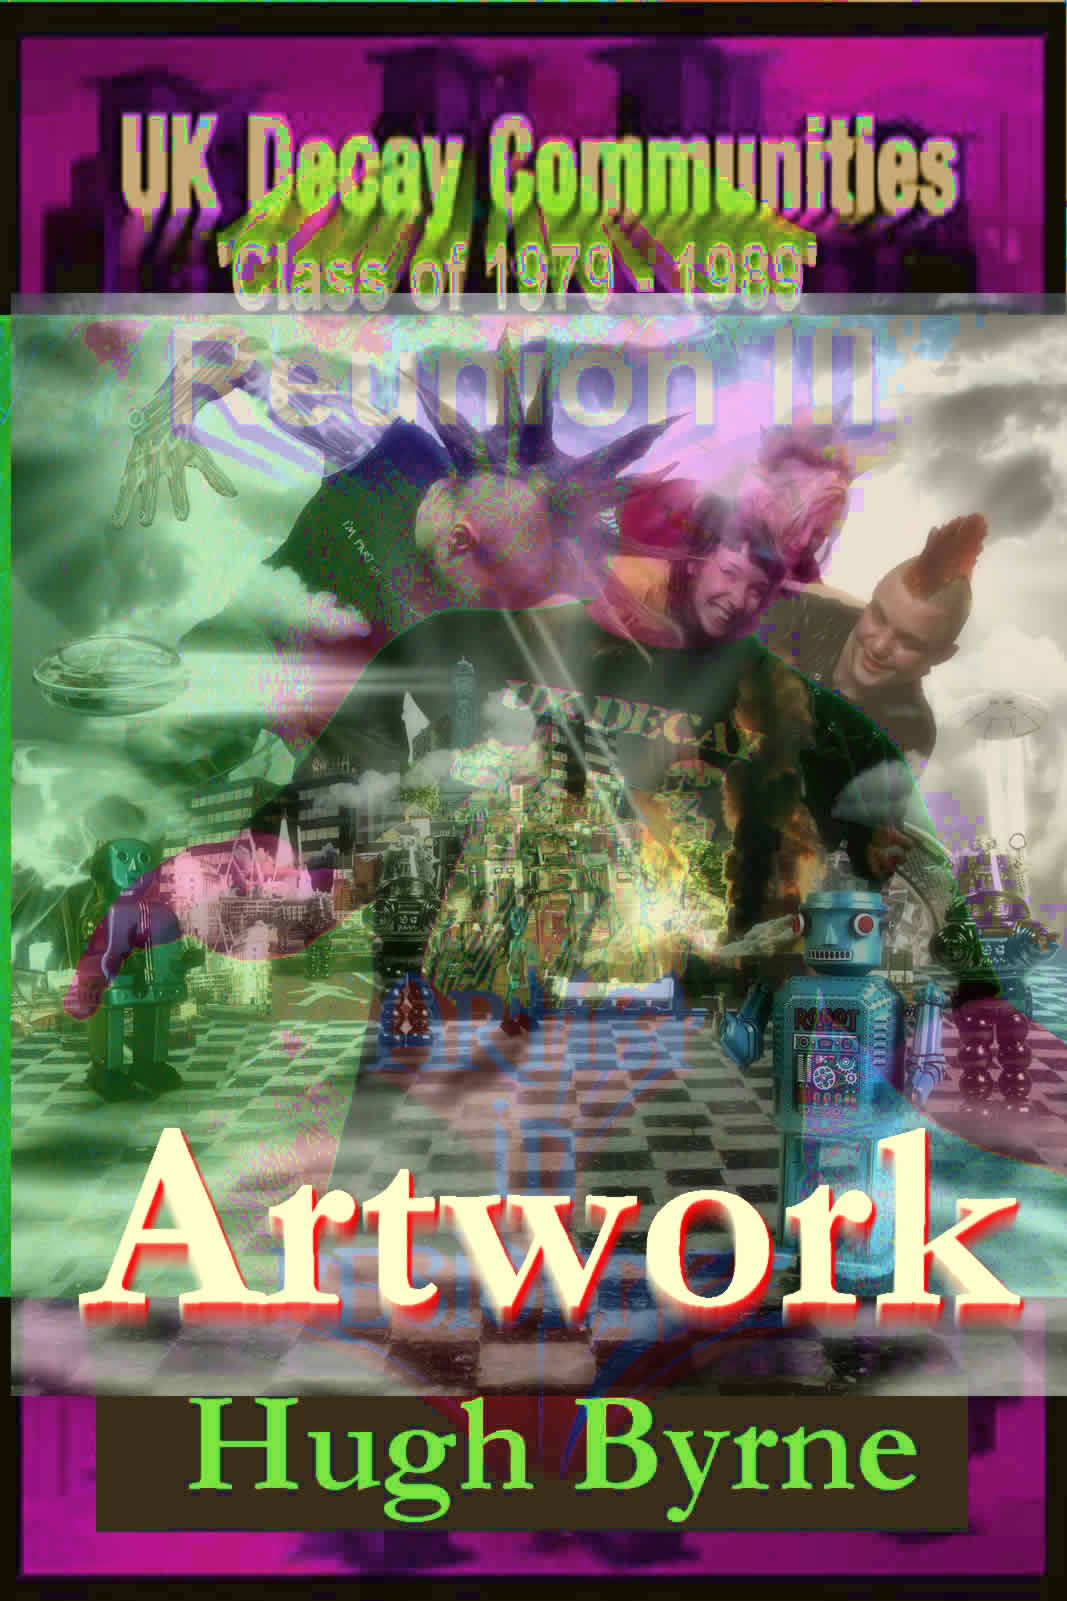 ukdkcomr3 artistinresidence Artwork